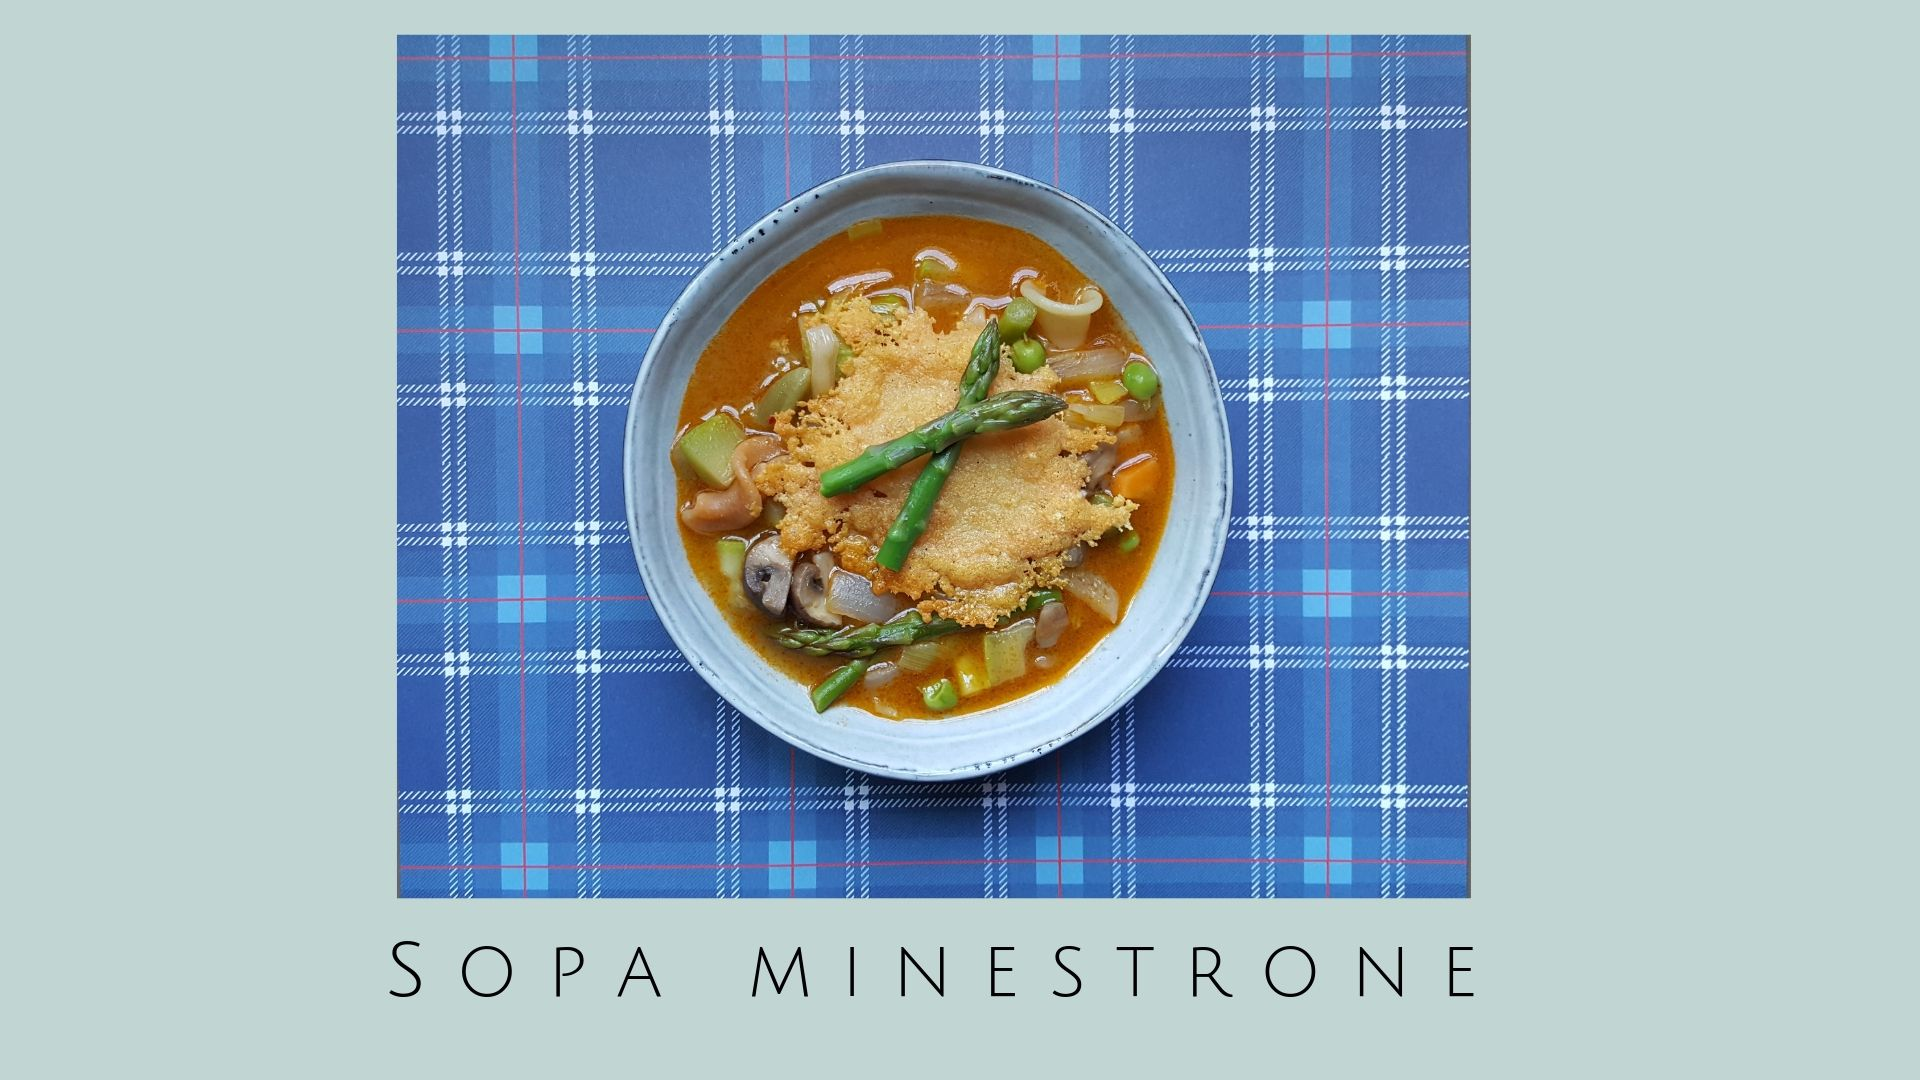 Sopa Minetsrone Receta fácil